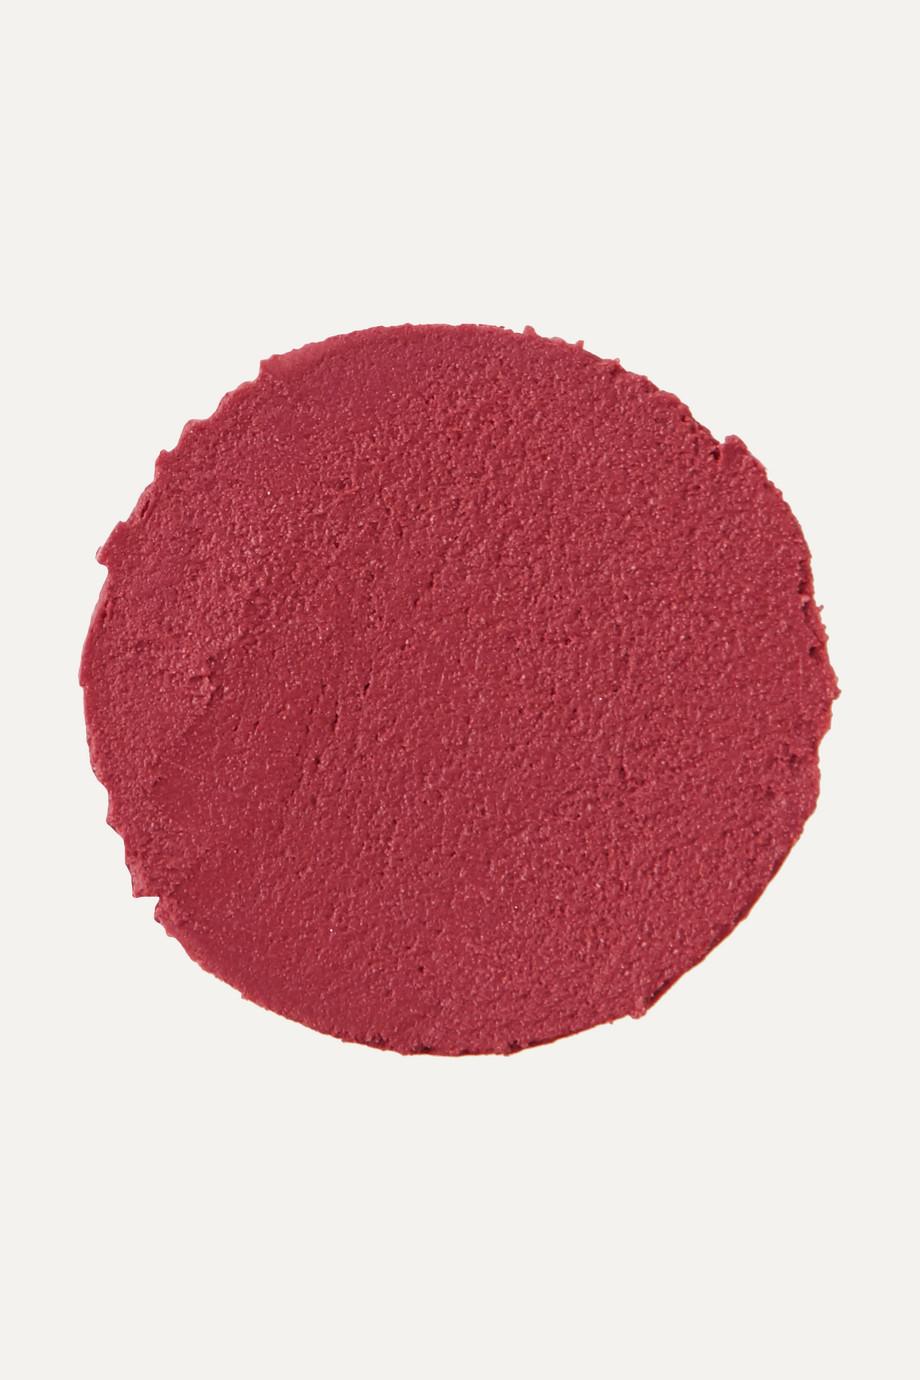 Bobbi Brown Crushed Lip Color - Babe